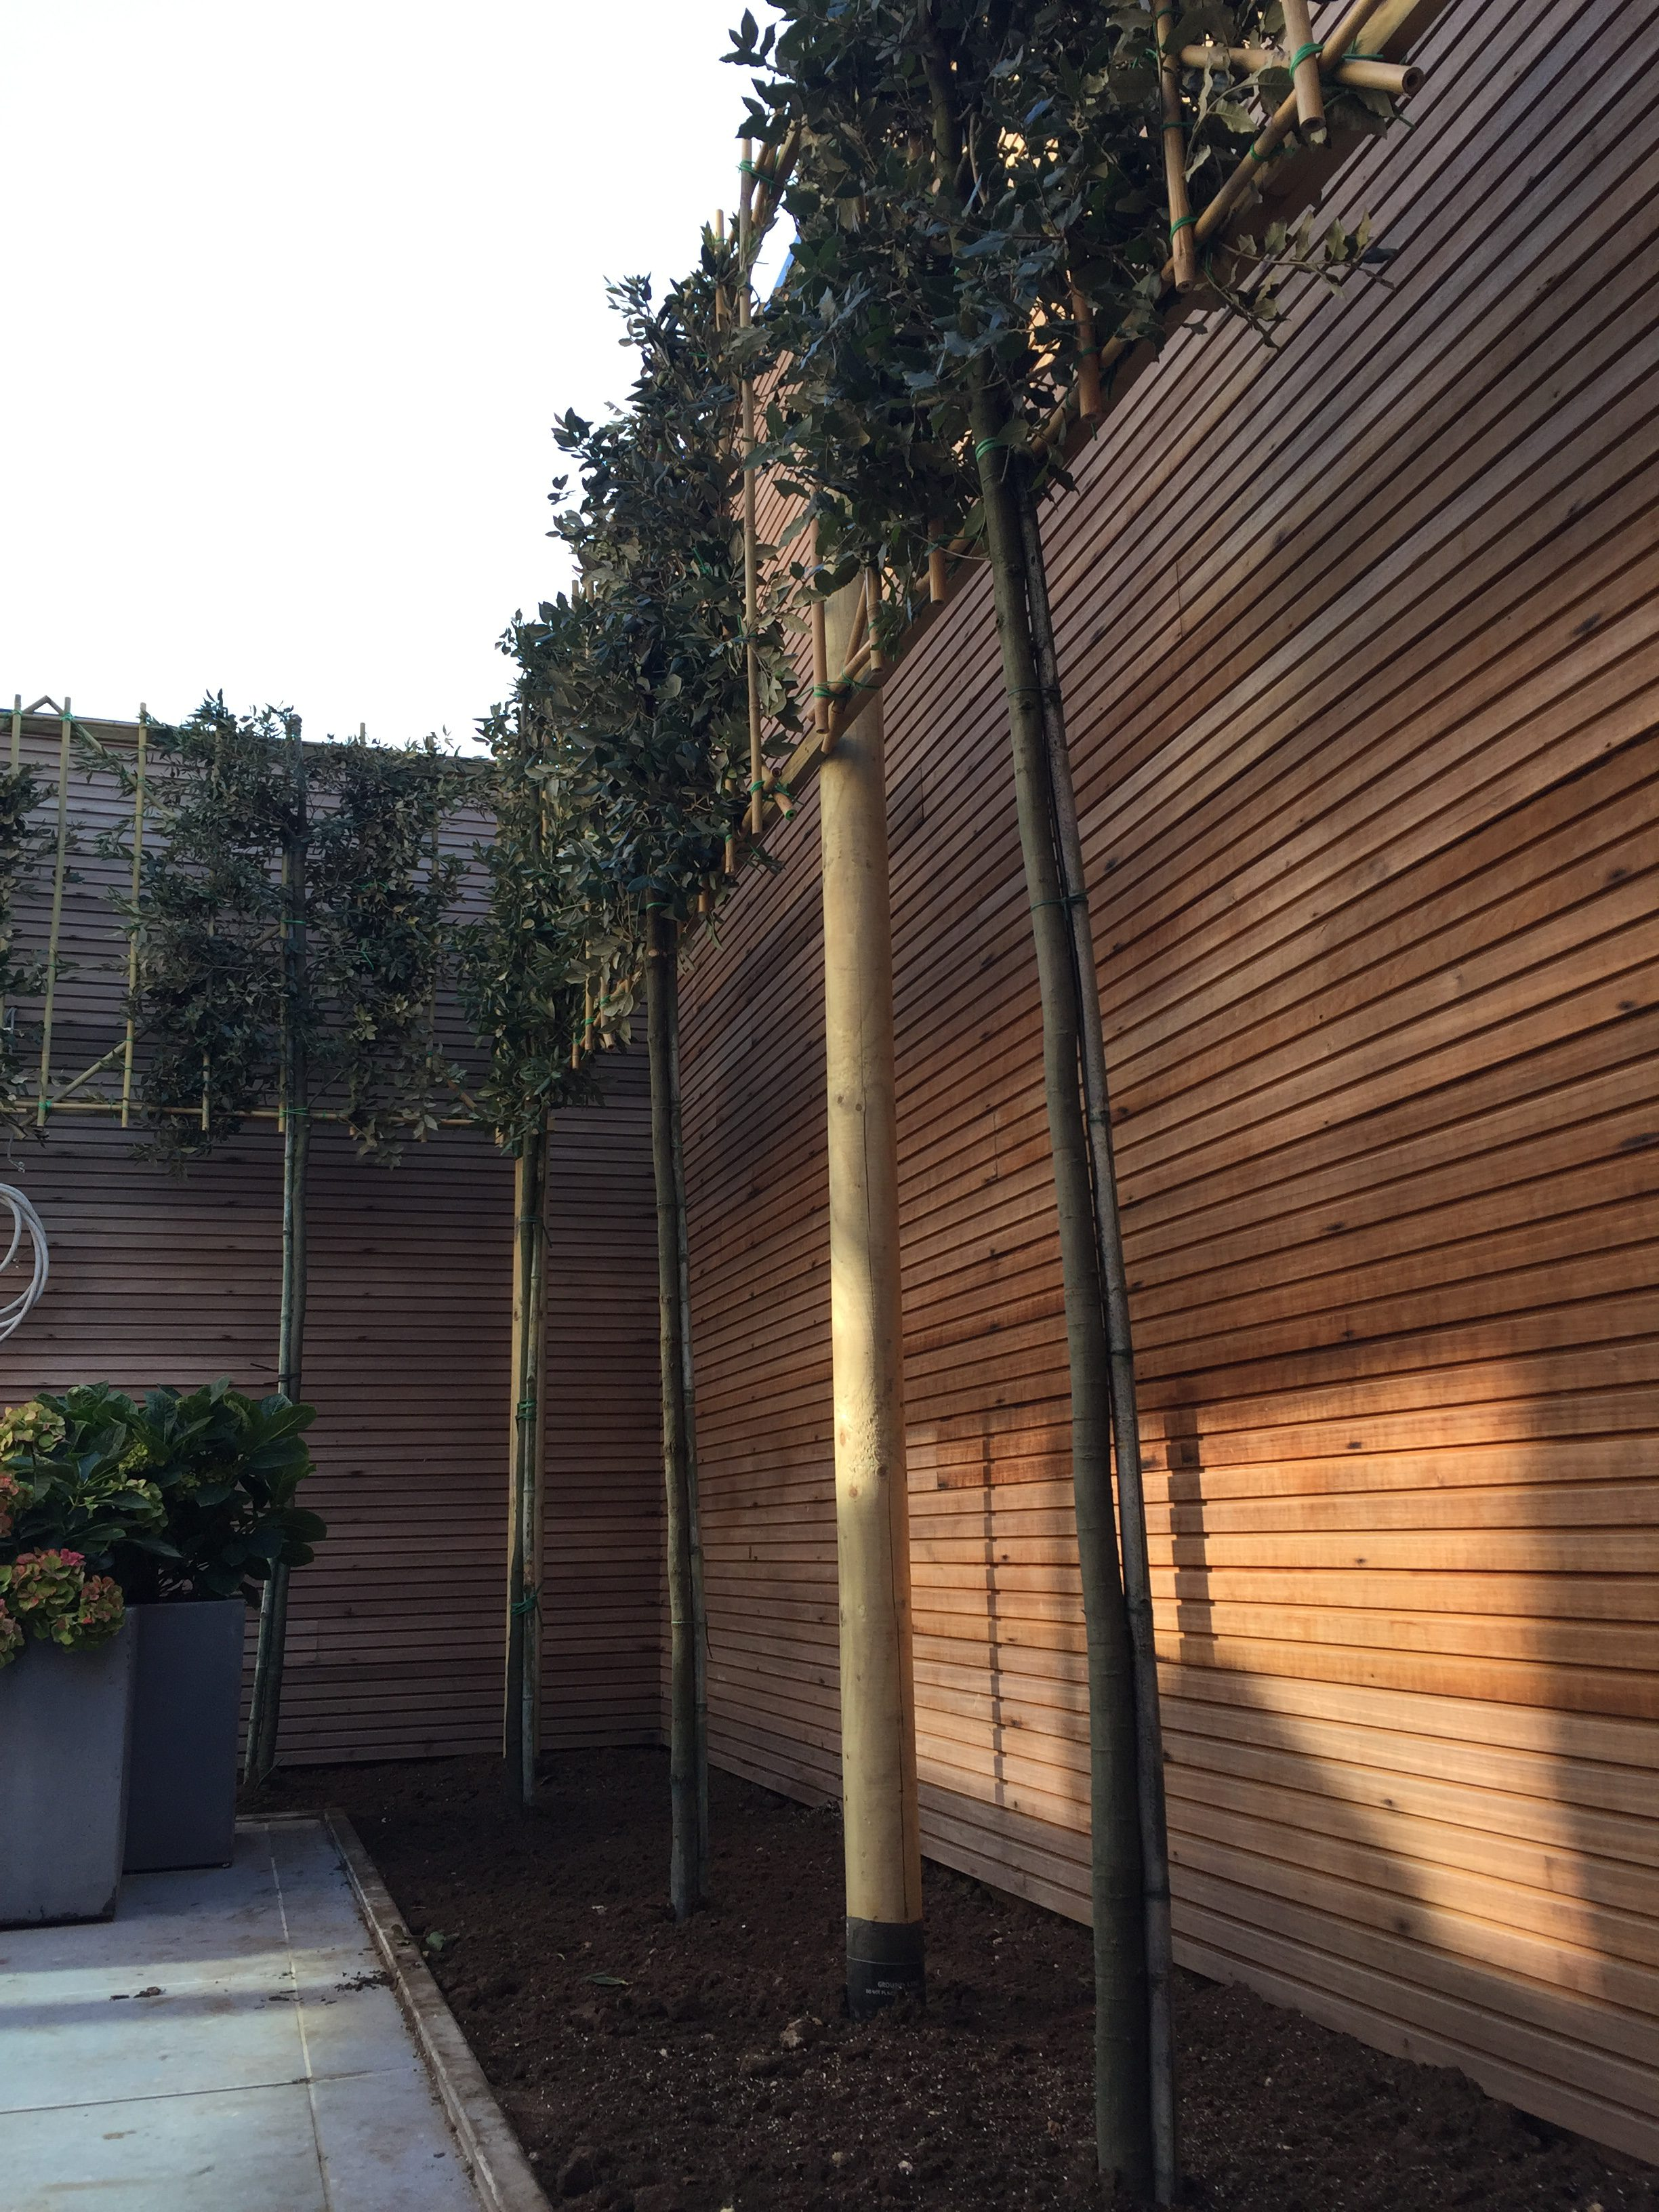 Uitgelezene PRIVACY SCREENS (wintergroene) leischermen - Privacy Trees CU-03